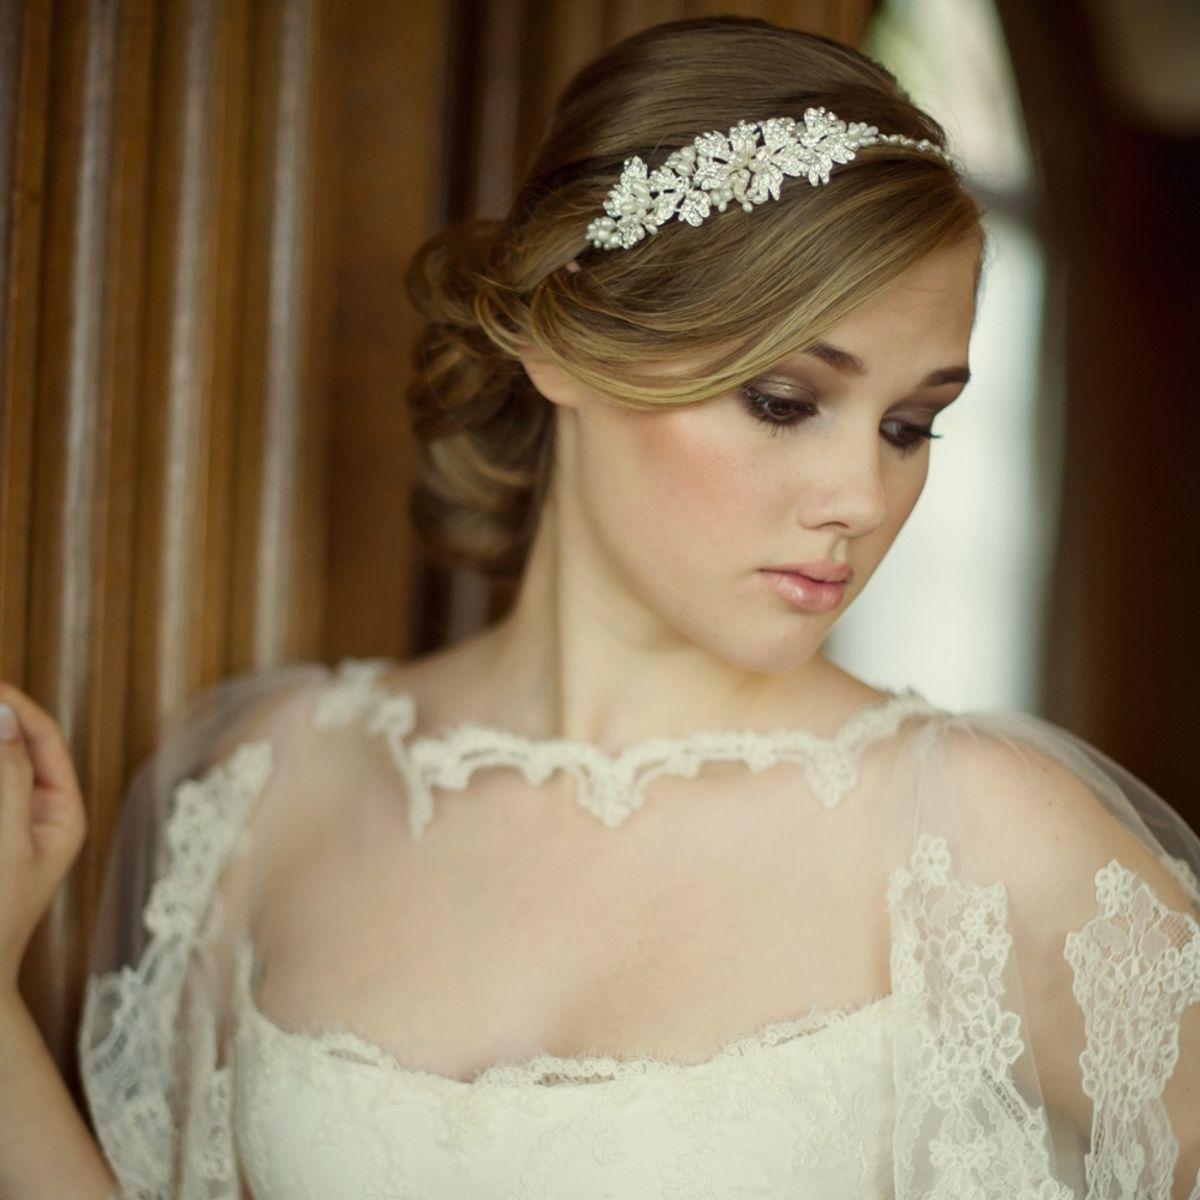 Tiaras wedding side tiara bridal necklace wedding bracelet tiara - Aye Do Ltd Evelyn Bridal Side Tiara Hdb2 Awj 102 00 Pearl Headband Wedding